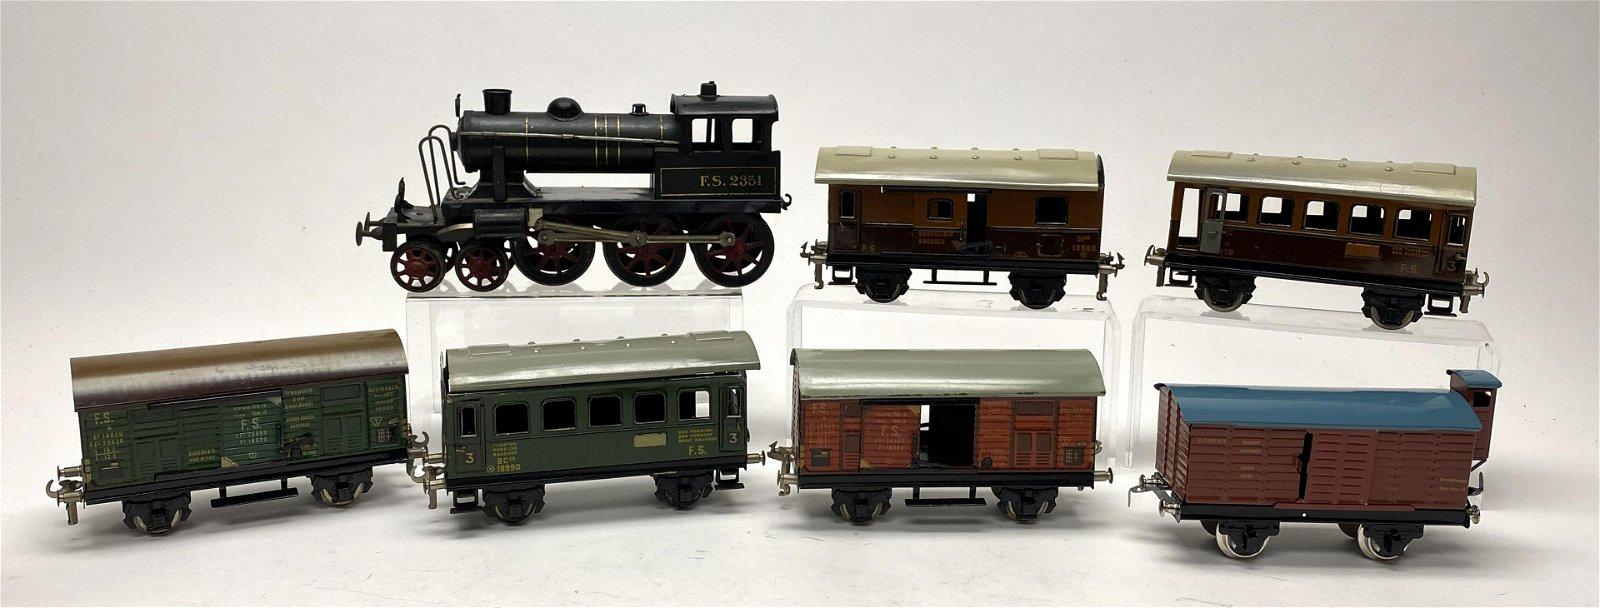 Locomotive and Six Train Cars